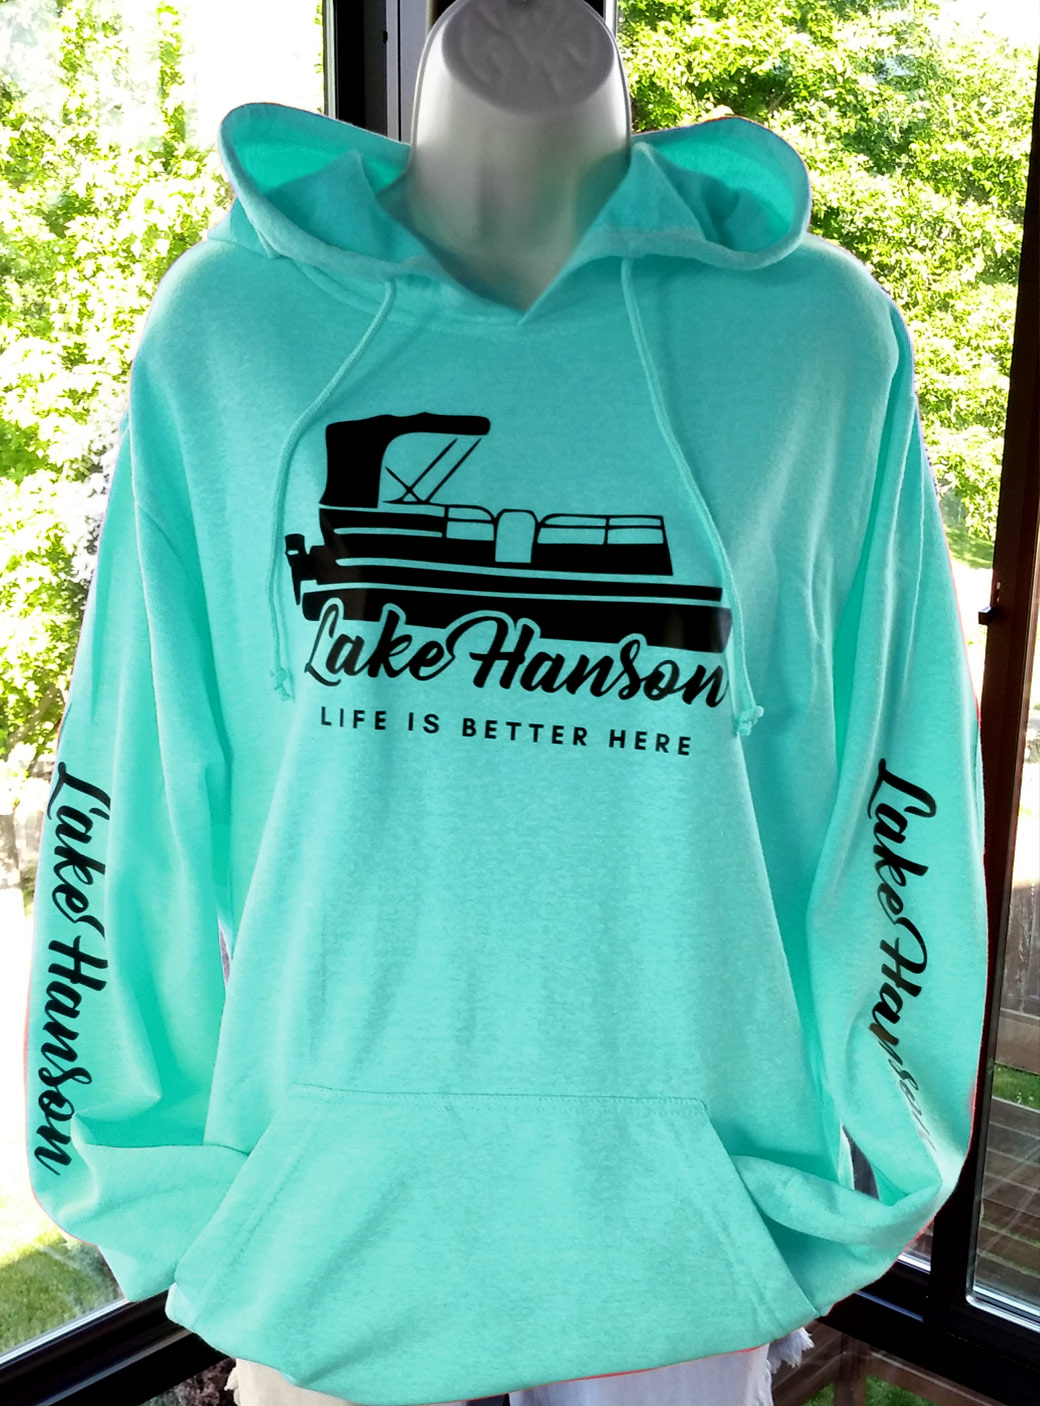 Lake Hanson Fleece Sweatshirt - Hoodie, Pullover charcoal - blue